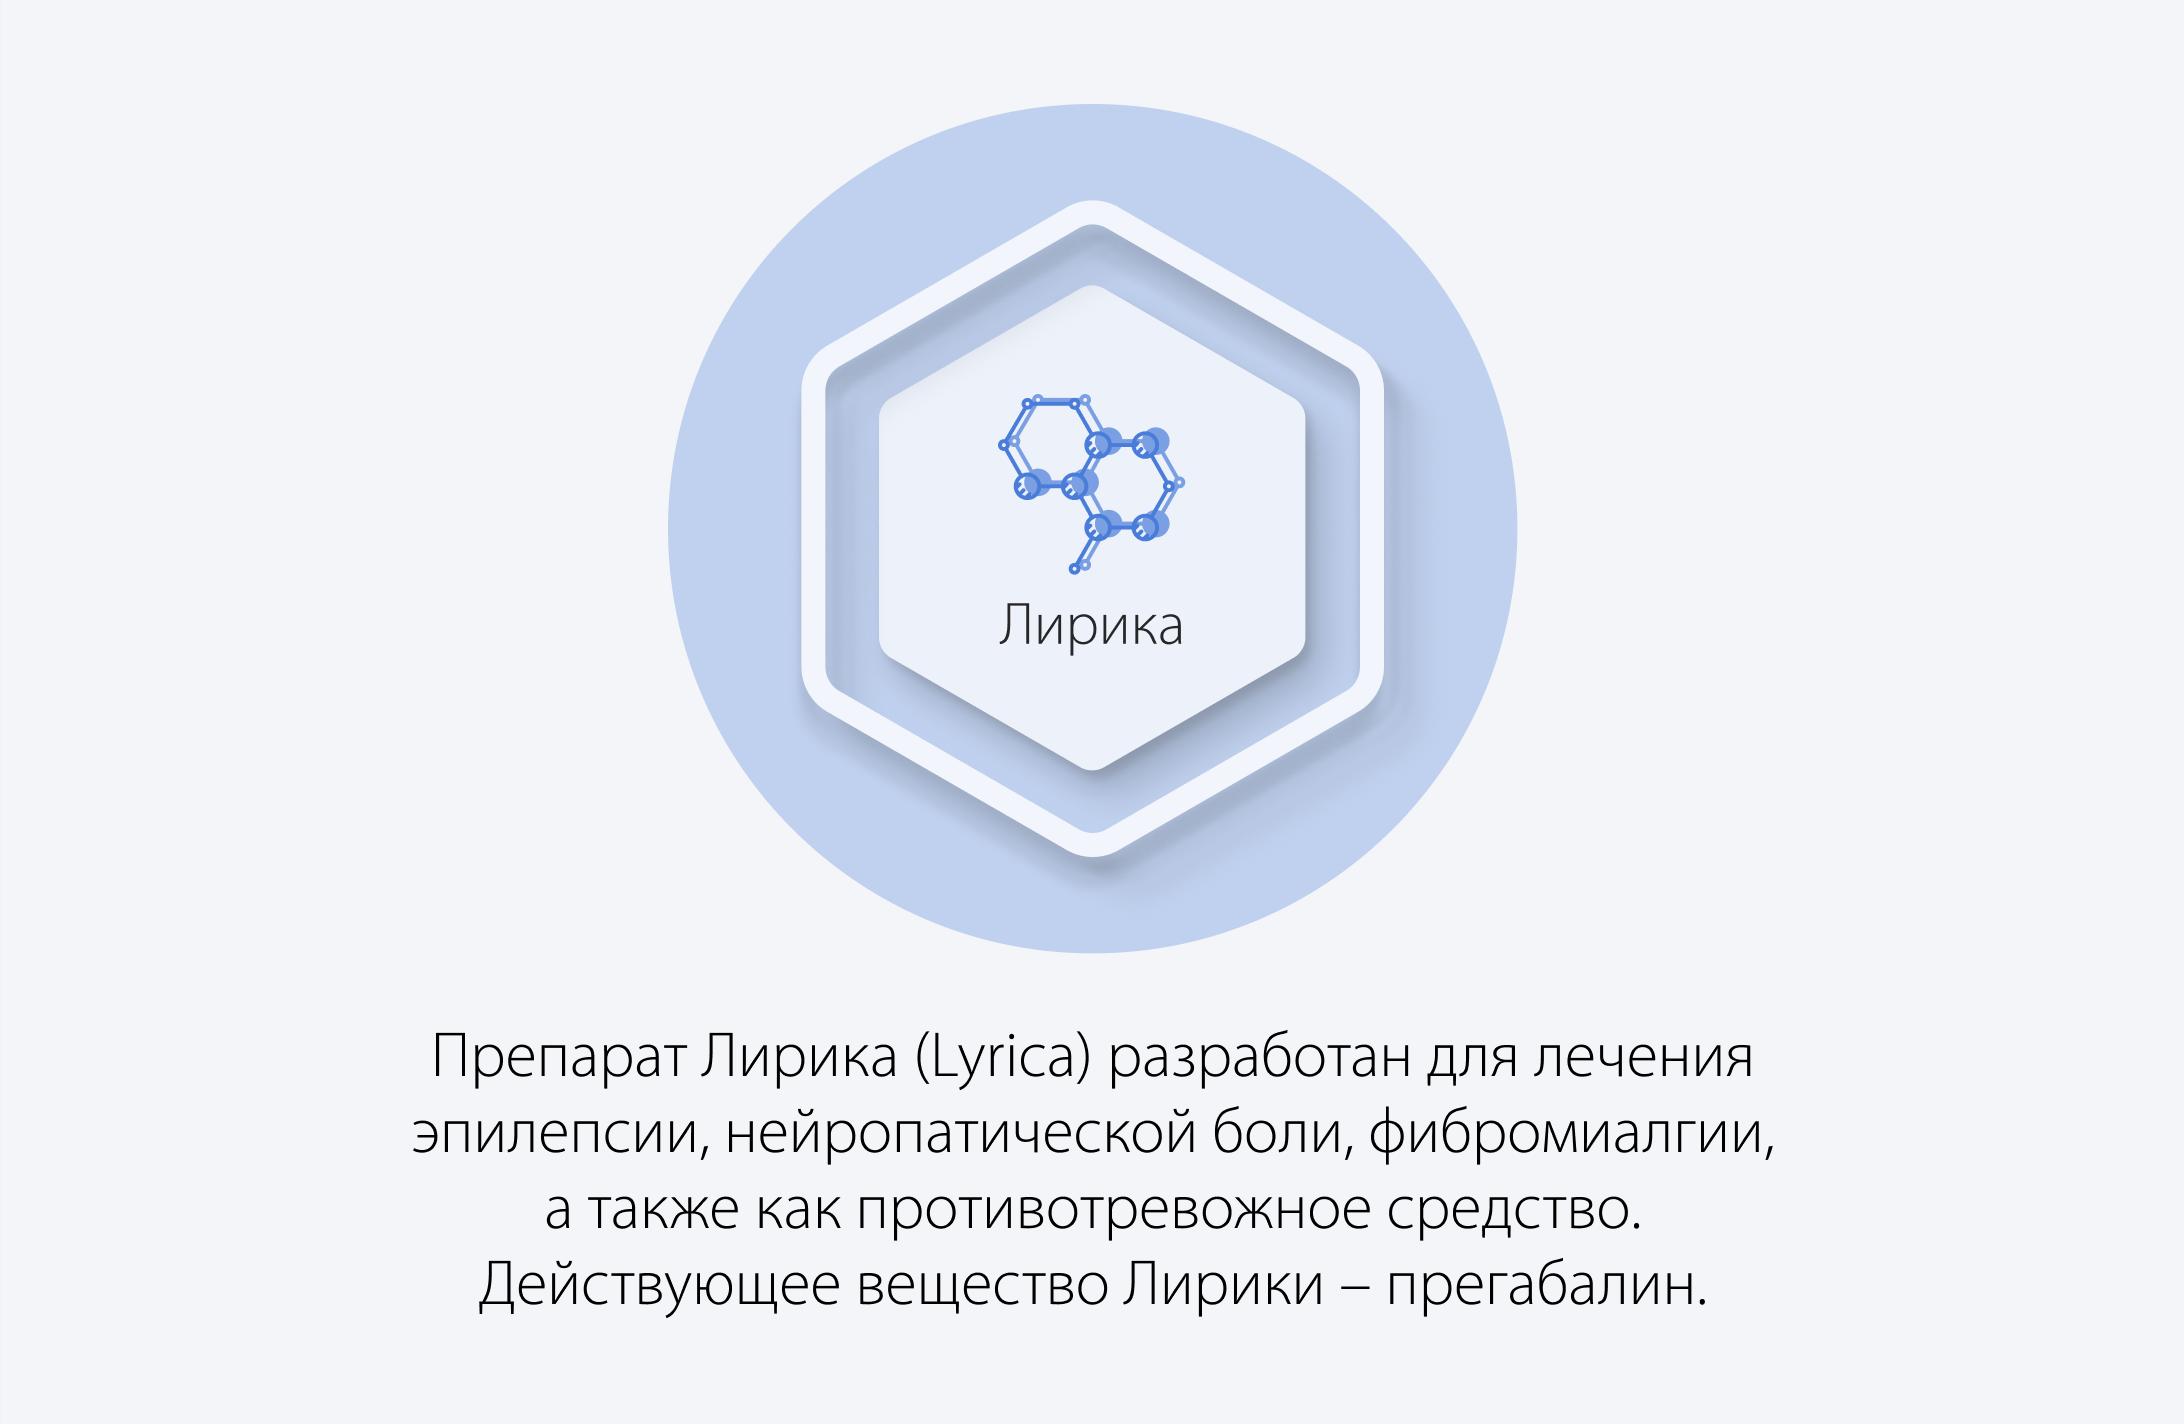 Препарат Лирика